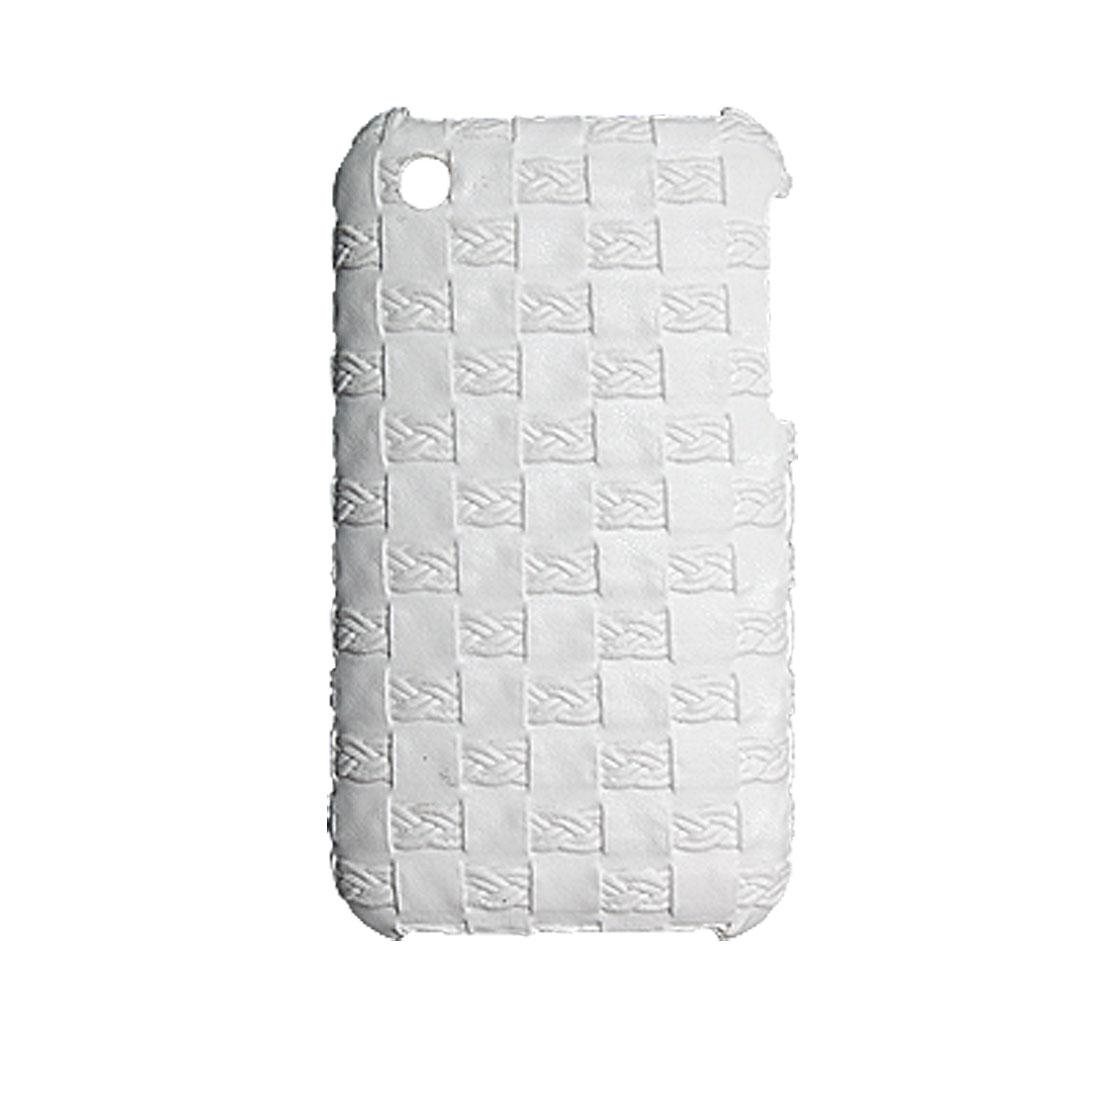 Plastic White Lattice Back Cover Case for iPhone 3G